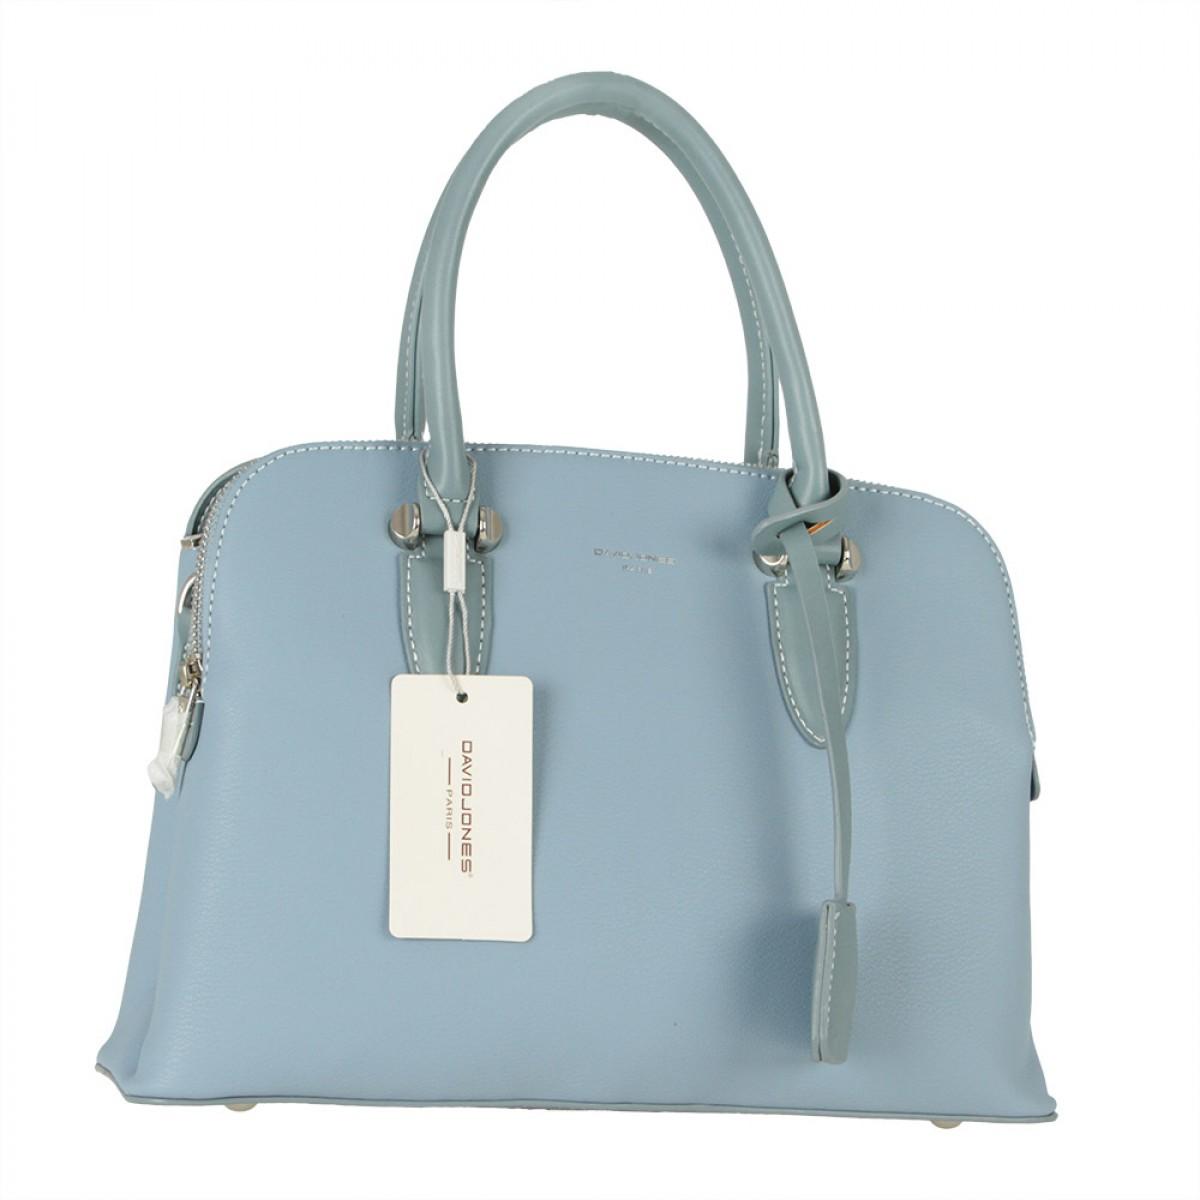 Жіноча сумка David Jones  6207-1A L.BLUE